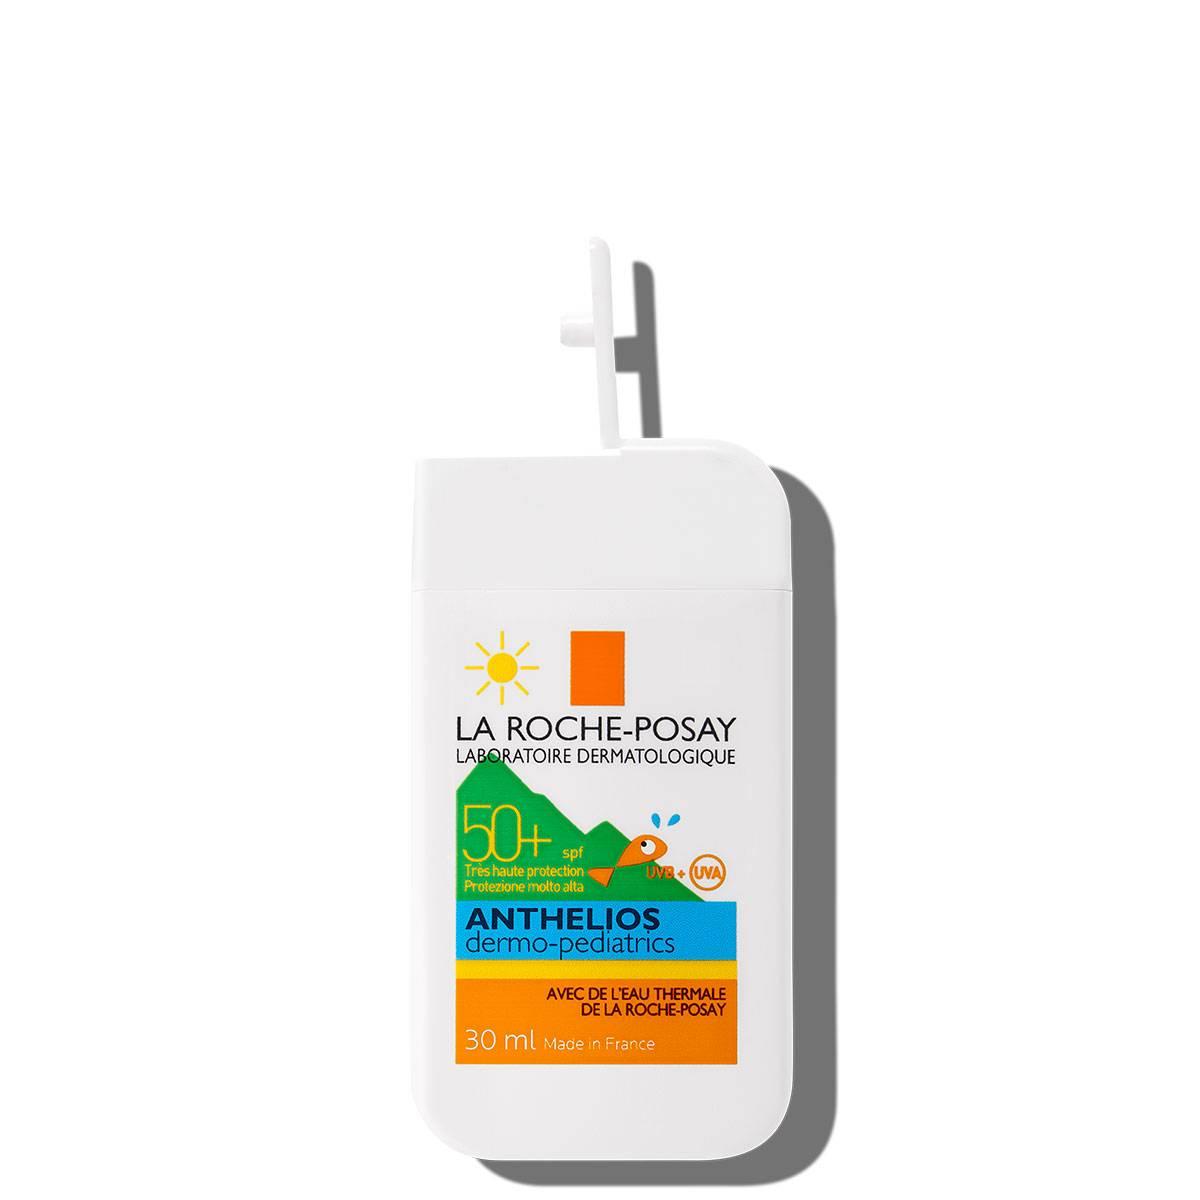 La Roche Posay ProduktSide Sol Anthelios Pocket Dermo Pediatrics Lotio